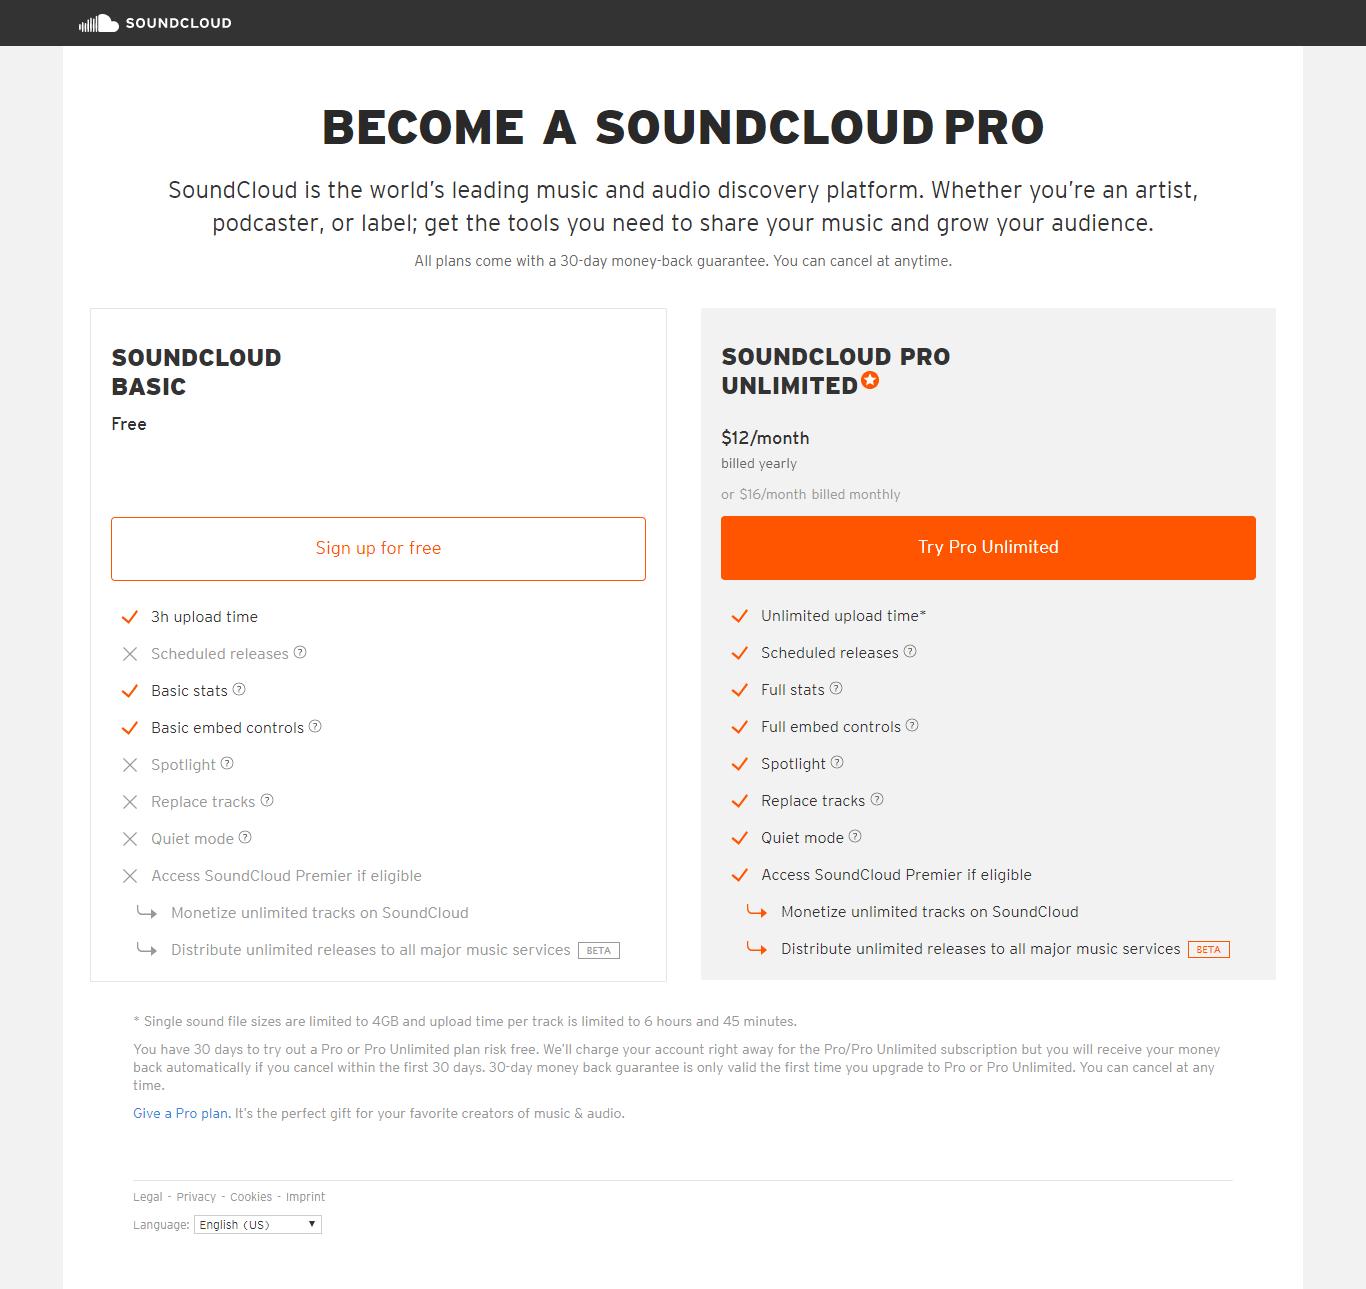 Become-a-SoundCloud-Pro-streamhash